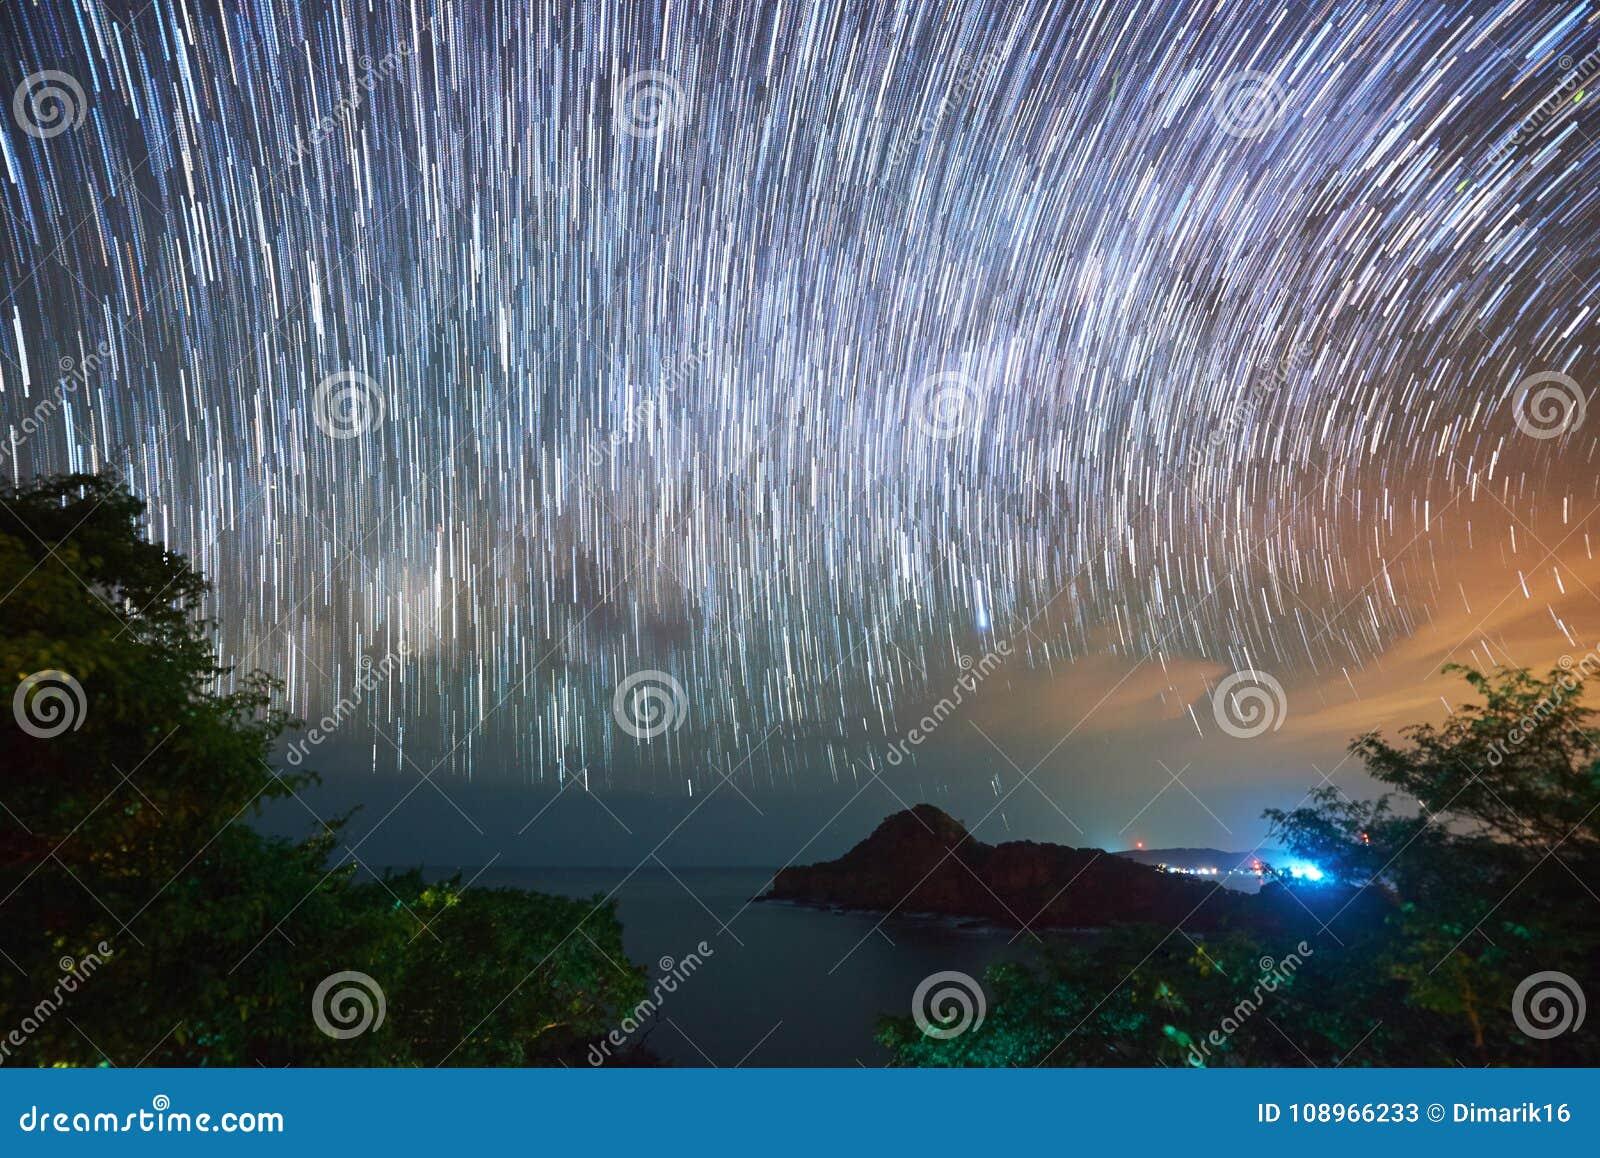 Stars moving at night sky